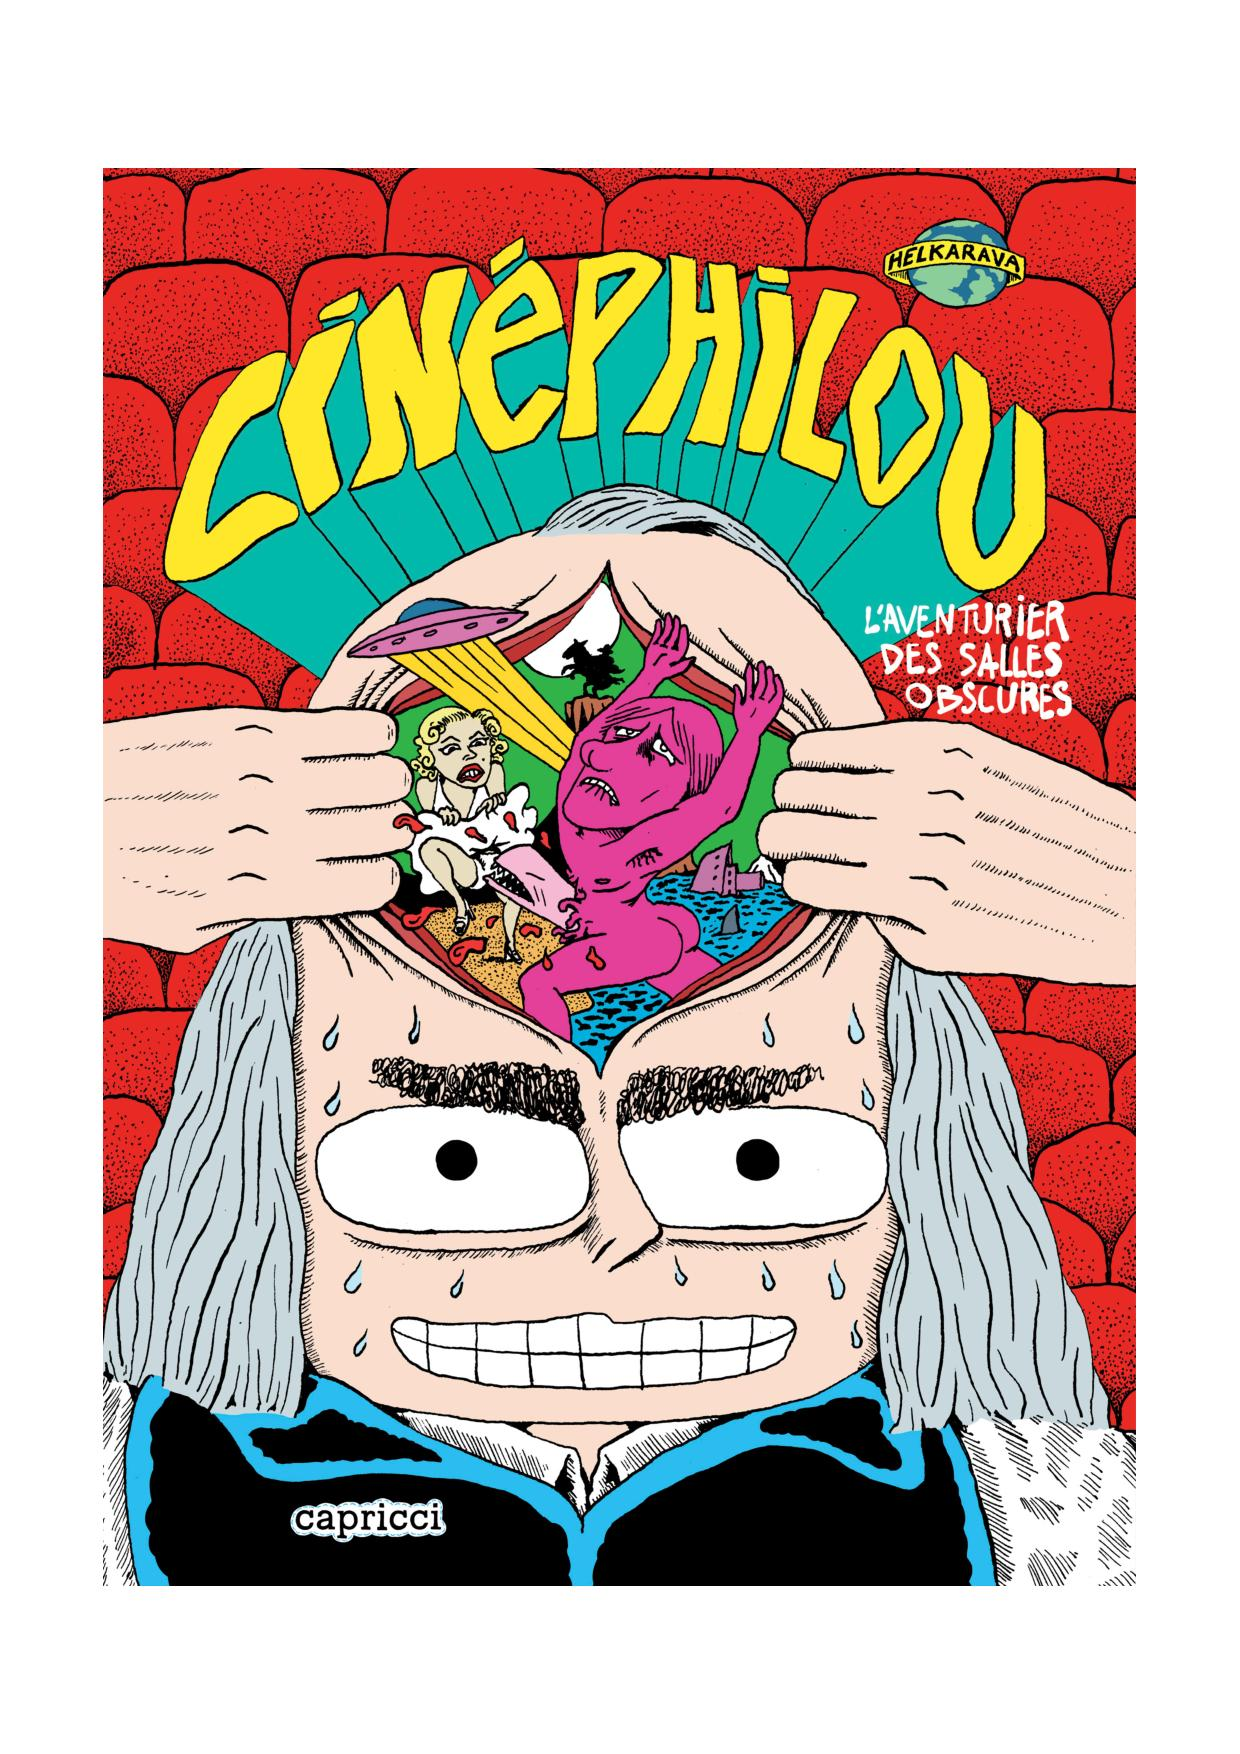 Strandkorb comic  cinephilou-page-001.jpg